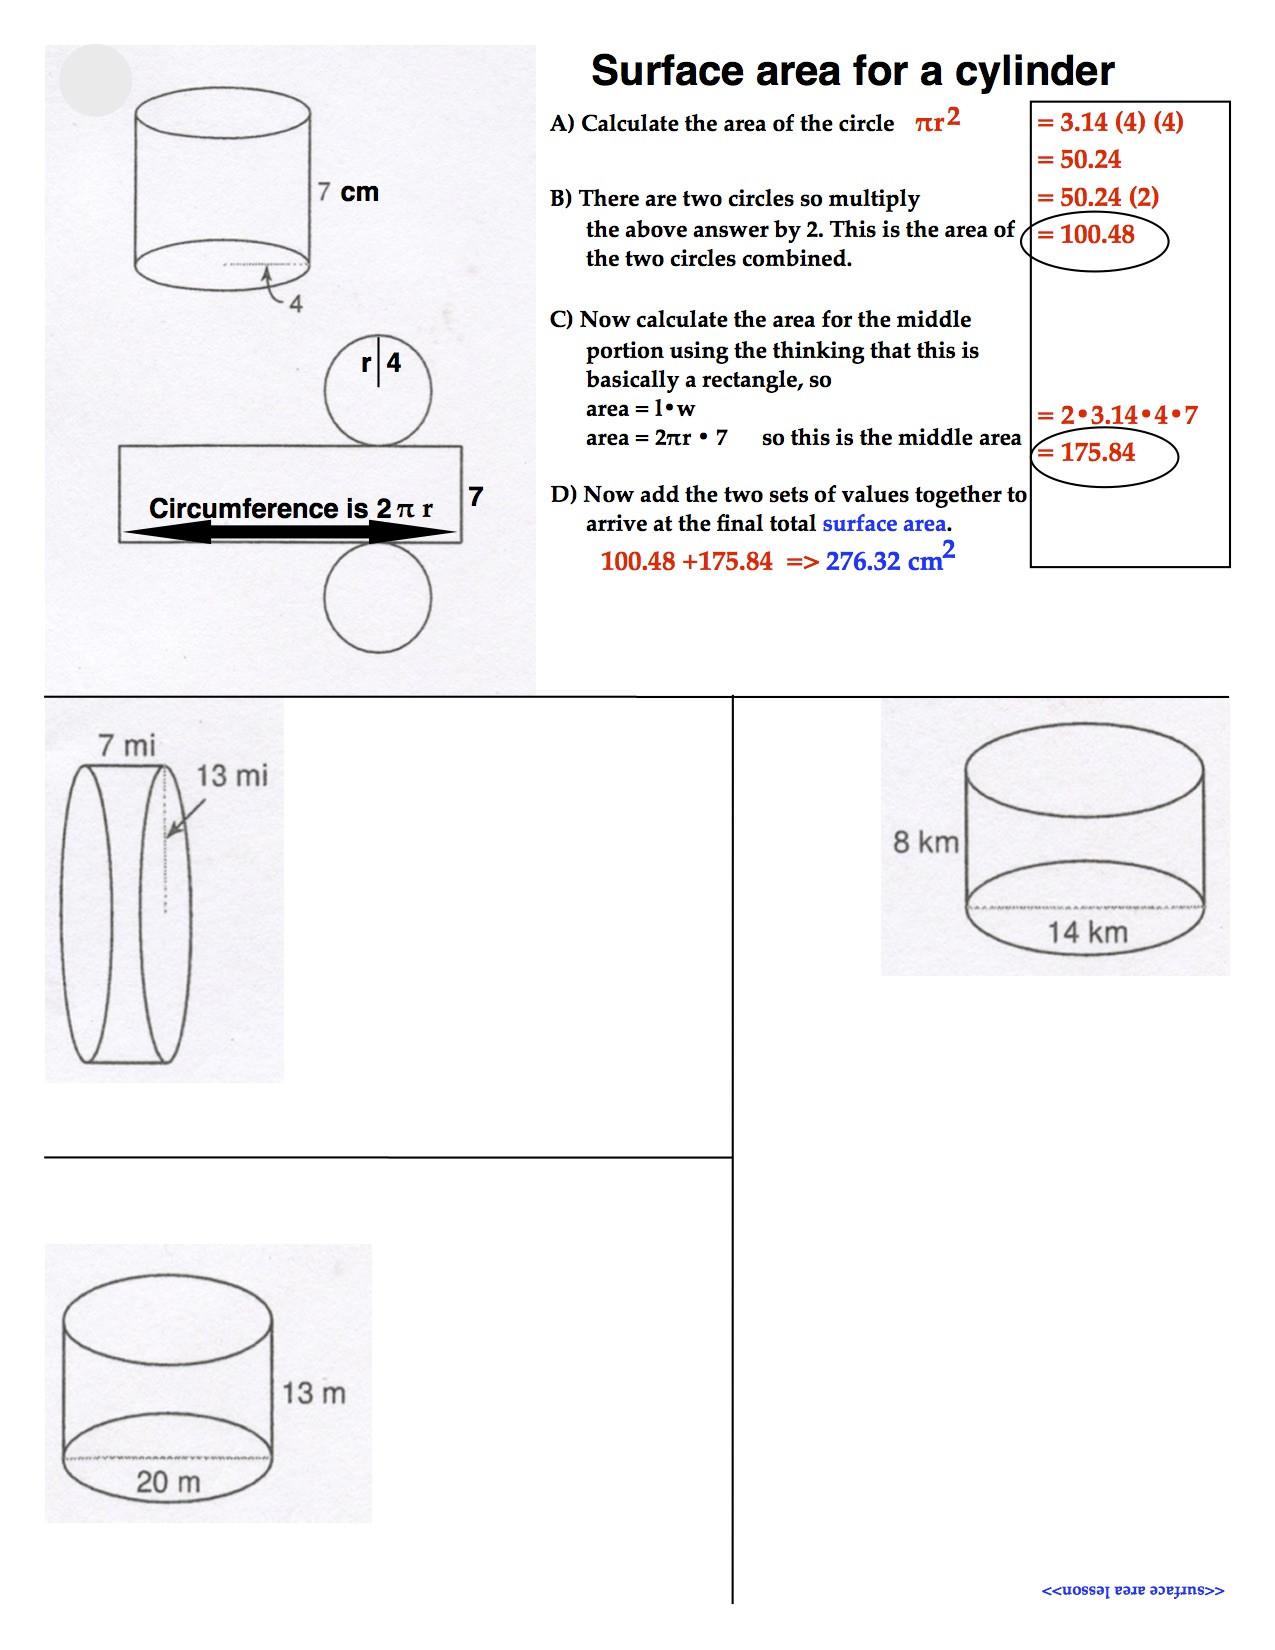 Scientific Notation Worksheet 8th Grade Surface area Math 8 Rsu 2